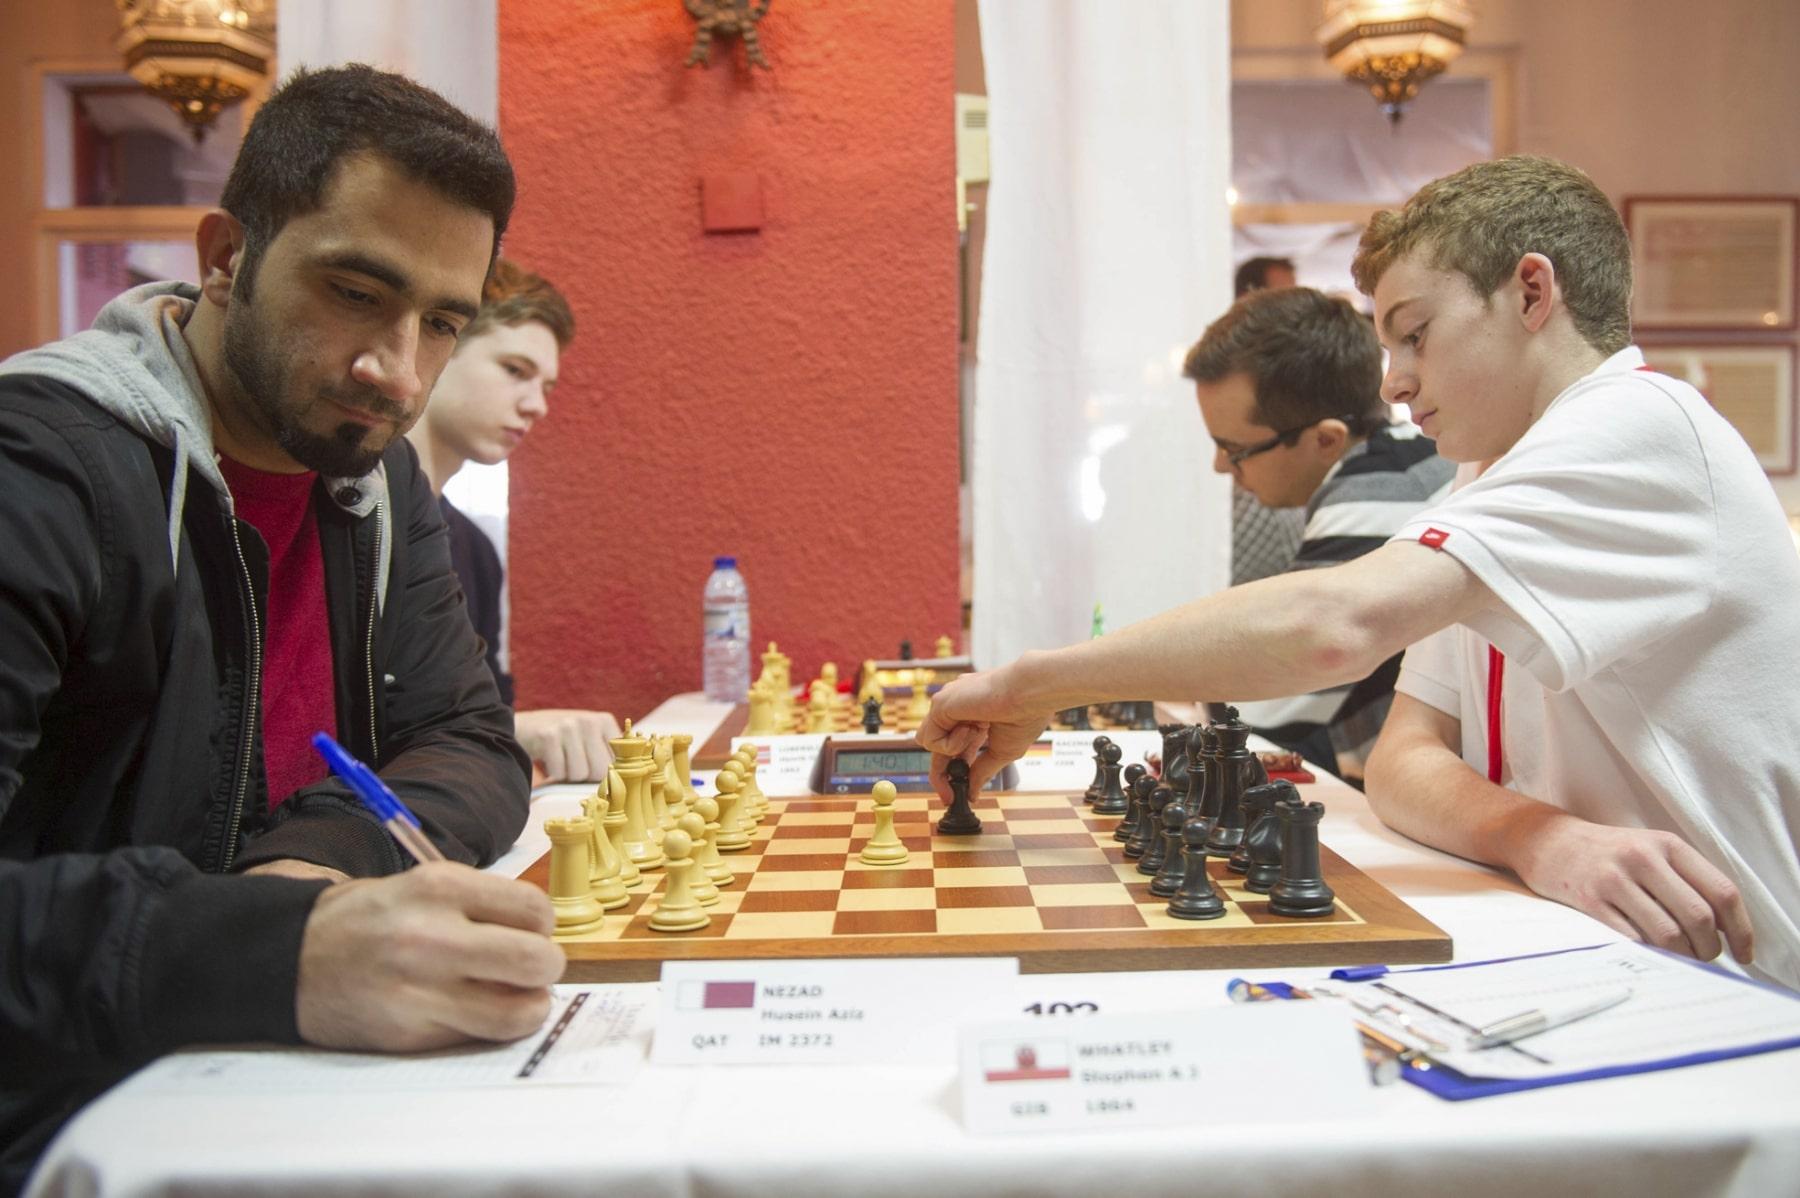 gibraltar-tradewise-chess-festival_012_12193317765_o